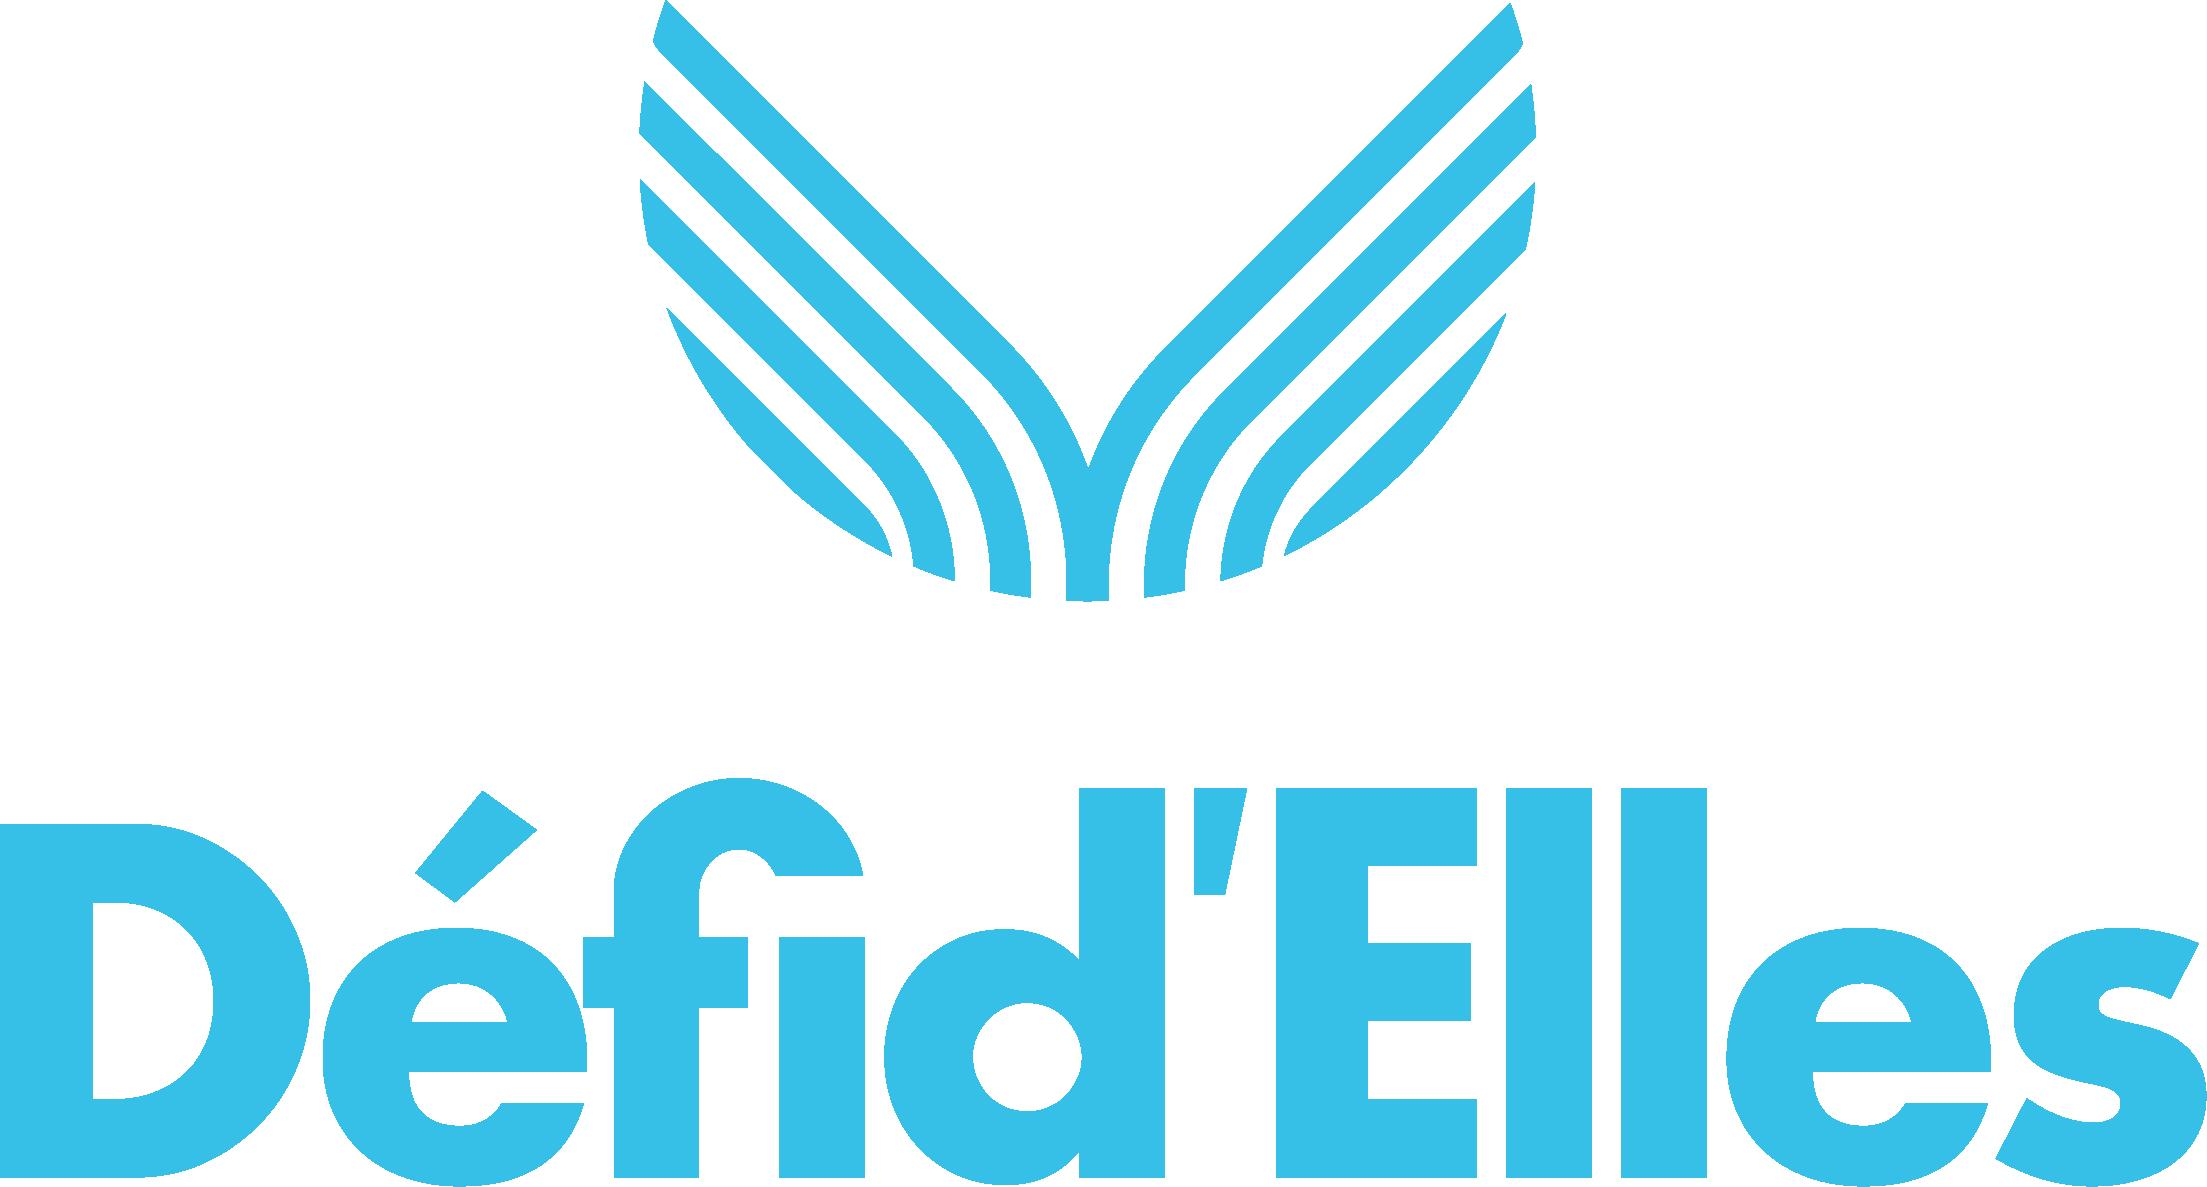 DFD_Logotype_vertical_Bleu_RVB_150_dpi (1).png